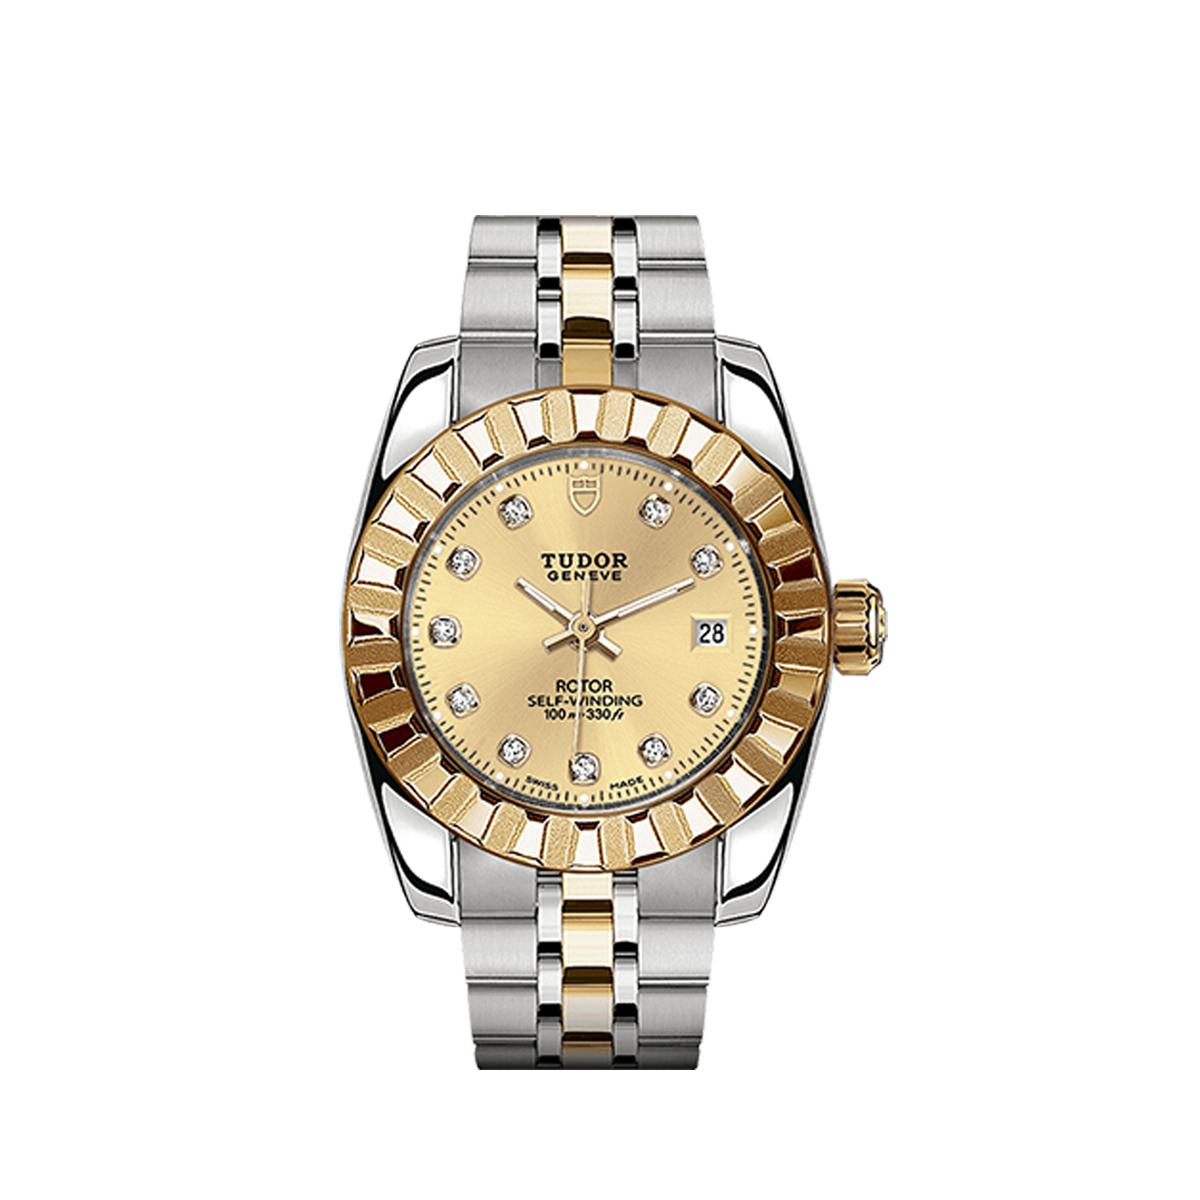 TUDOR Classic watch £2,033 at David M Robinson